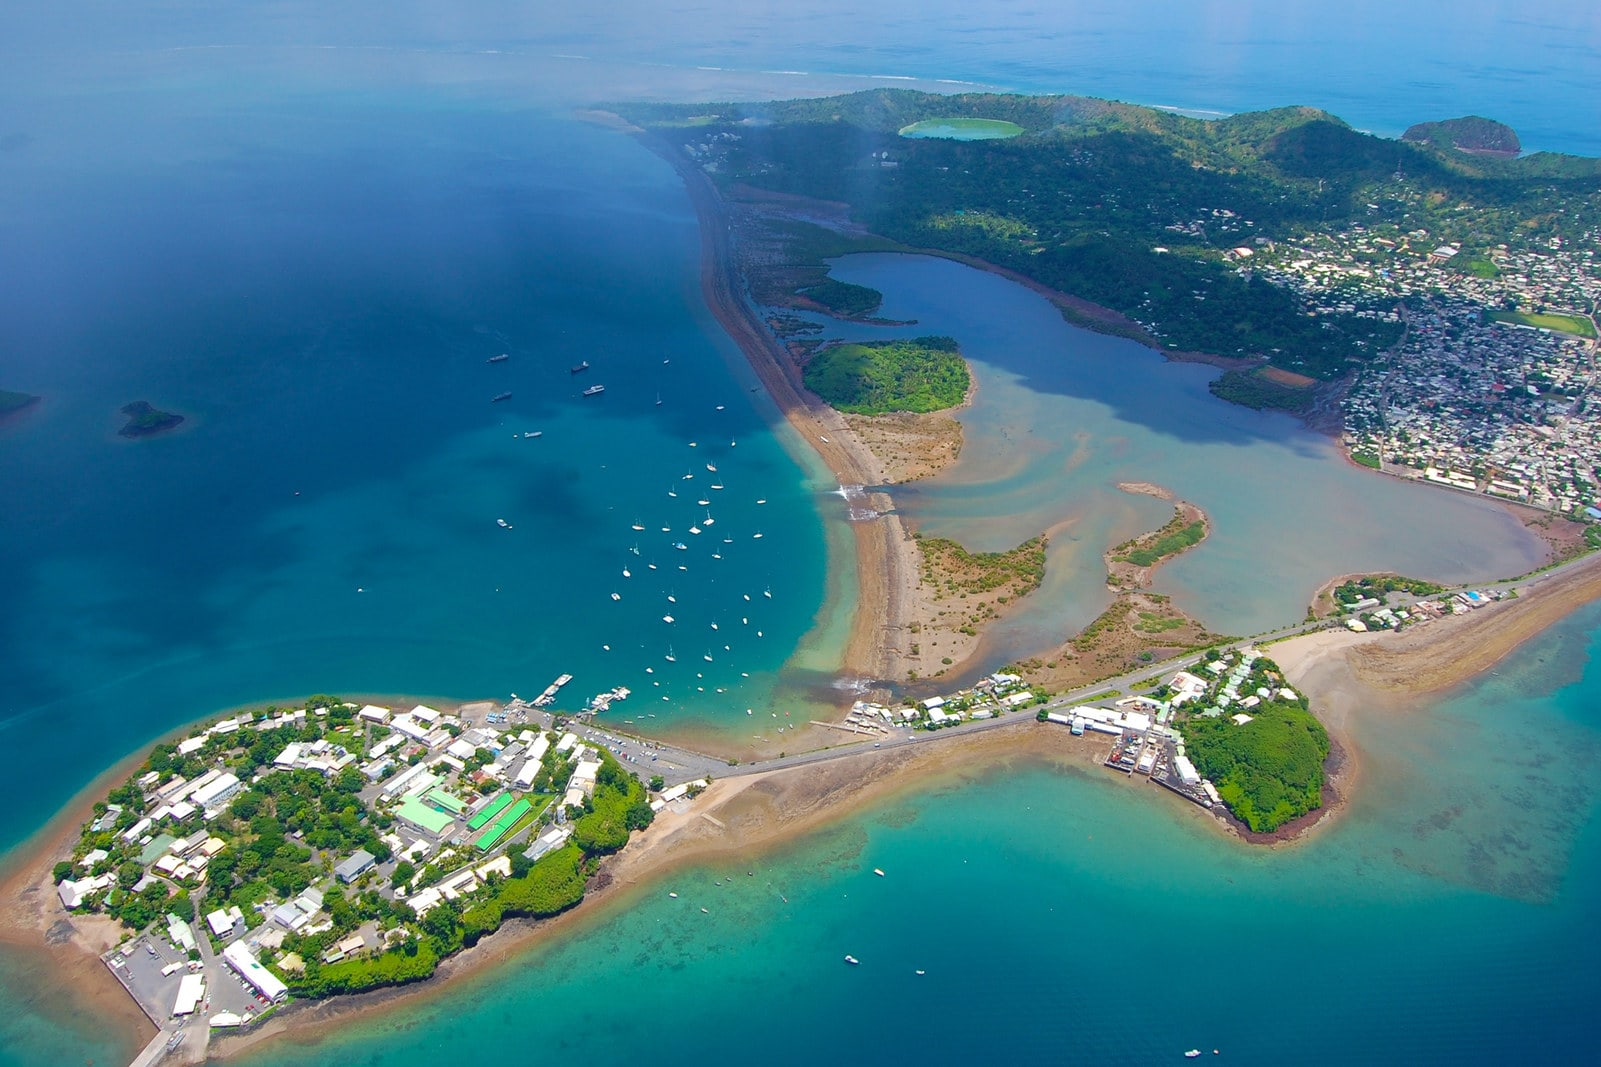 Mayotte Island Aerial Image East Africa